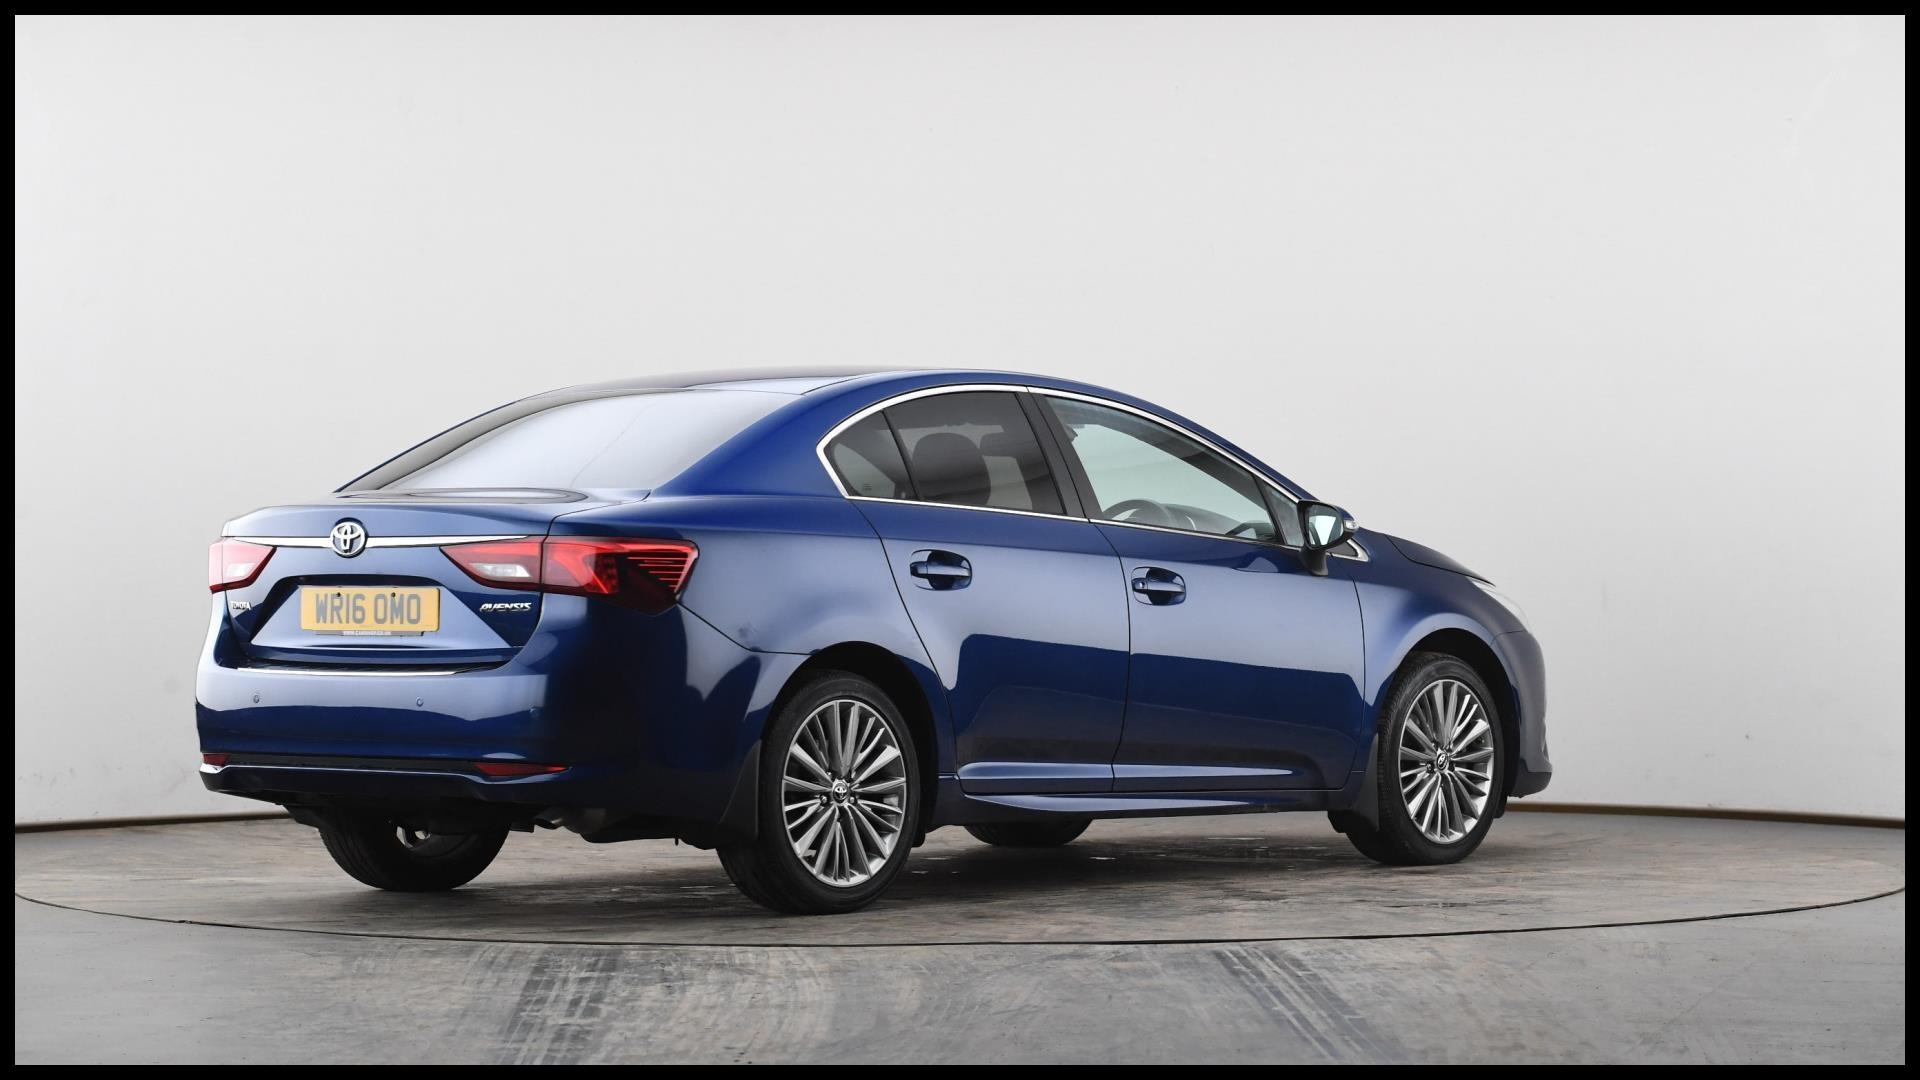 Toyota Used Car Warranty Best Hot News toyota 2018 Warranty Unique Used toyota Avensis 2